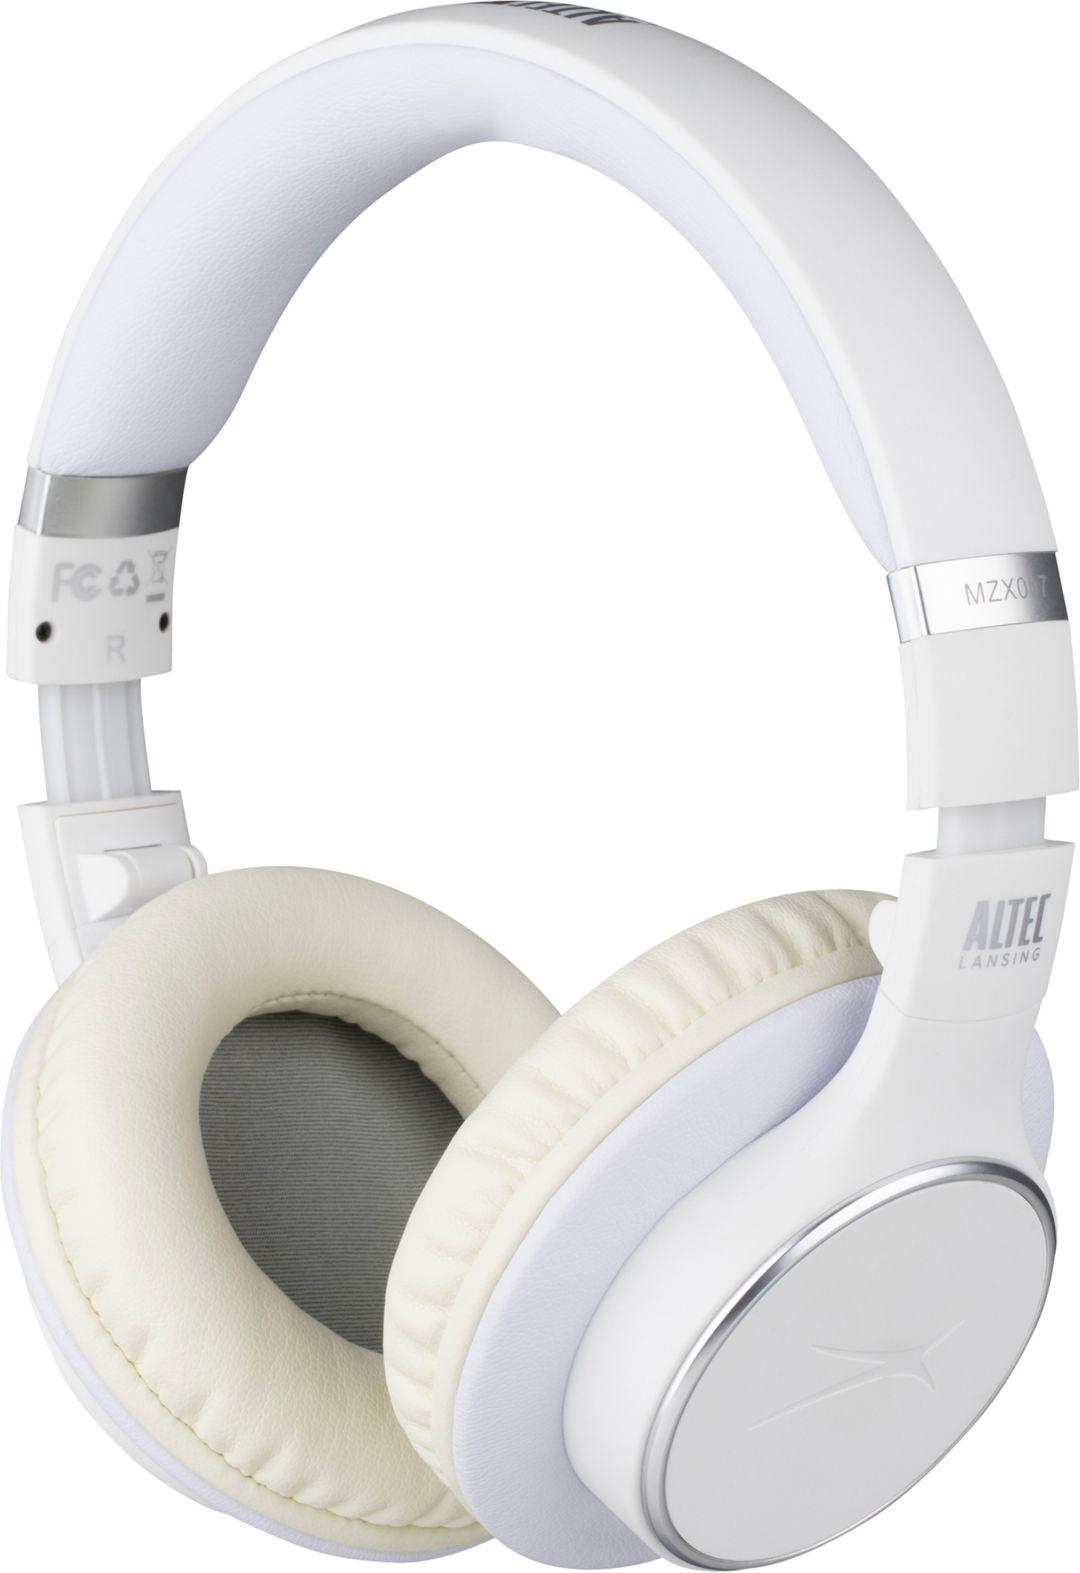 Altec Lansing 007 Bluetooth Headphones Field Stream